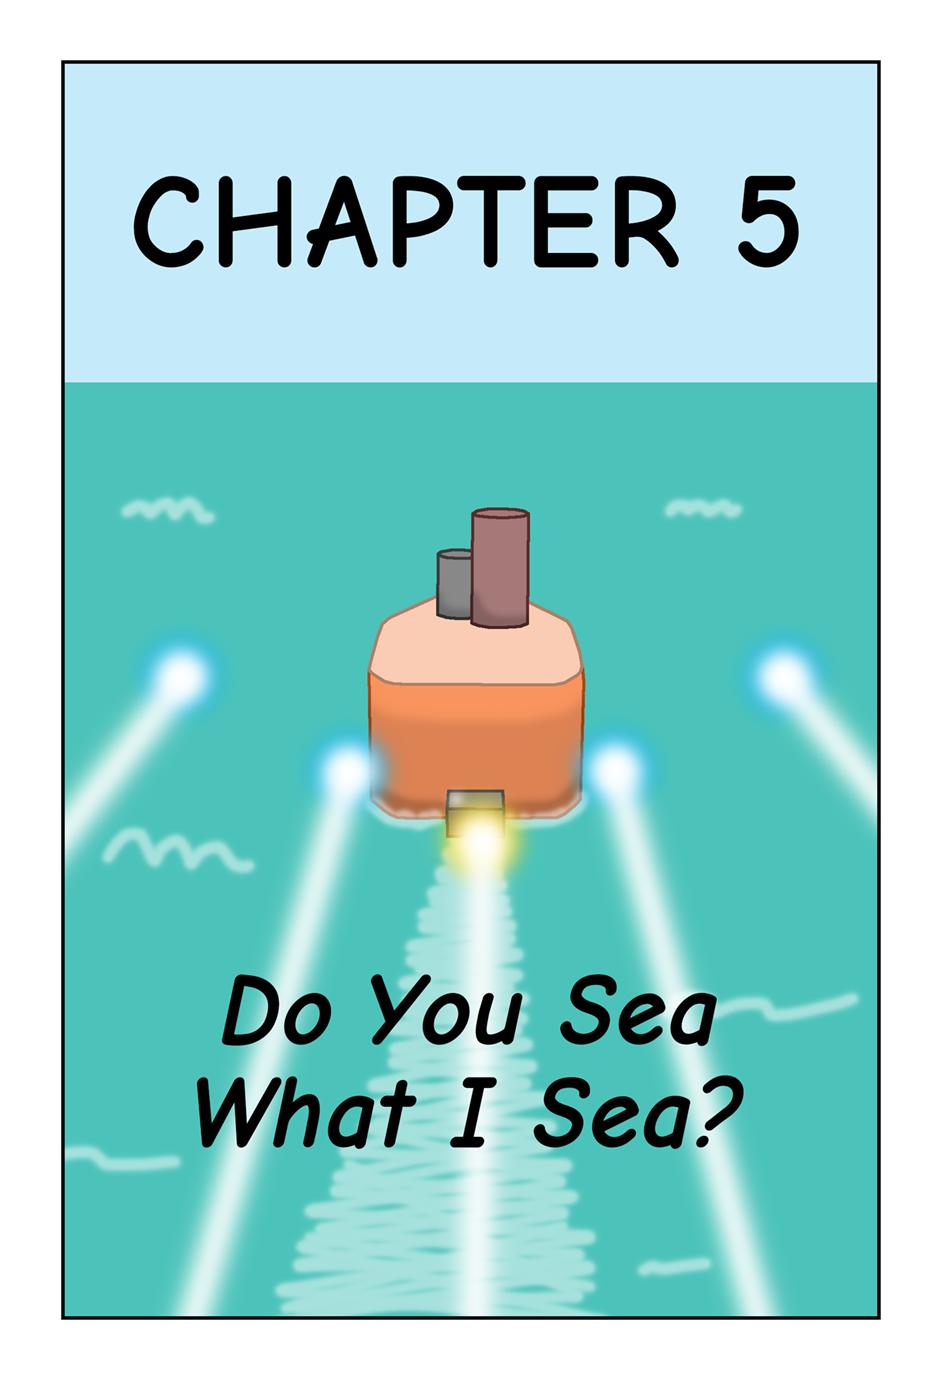 CHAPTER 5 - DO YOU SEA WHAT I SEA?